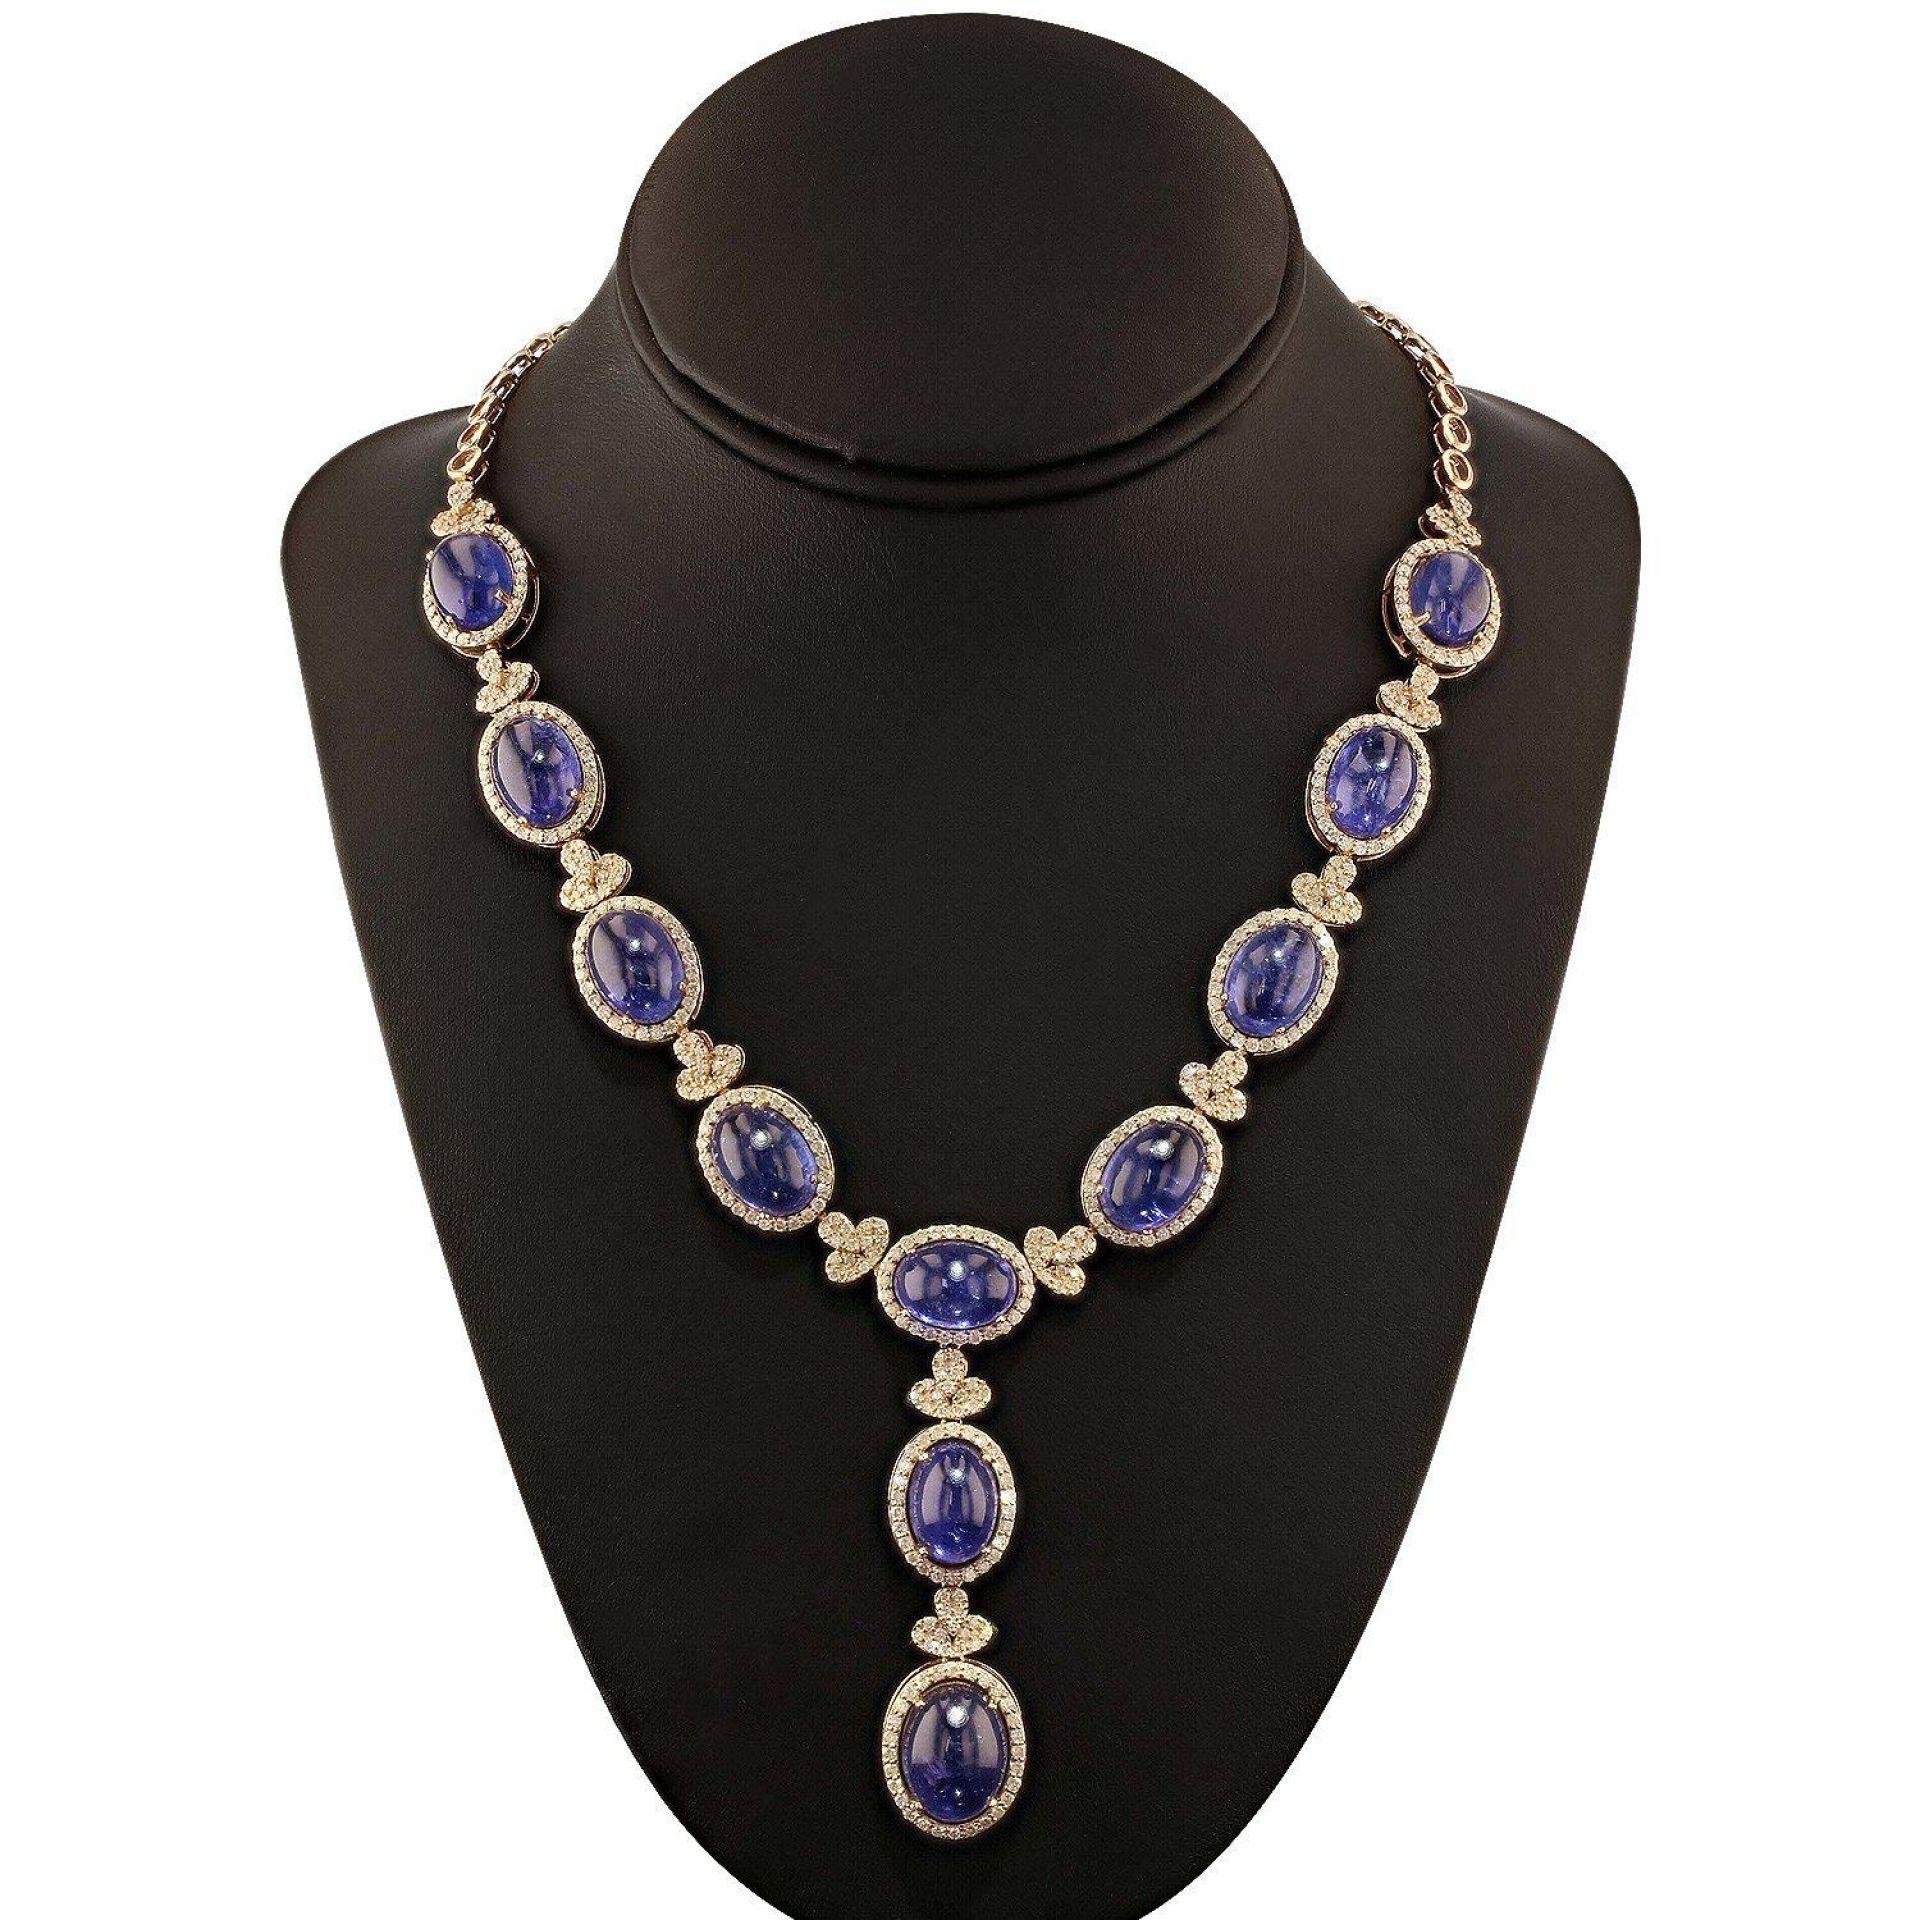 97.79ctw Tanzanite and 6.55ctw Diamond 14K Yellow Gold Necklace